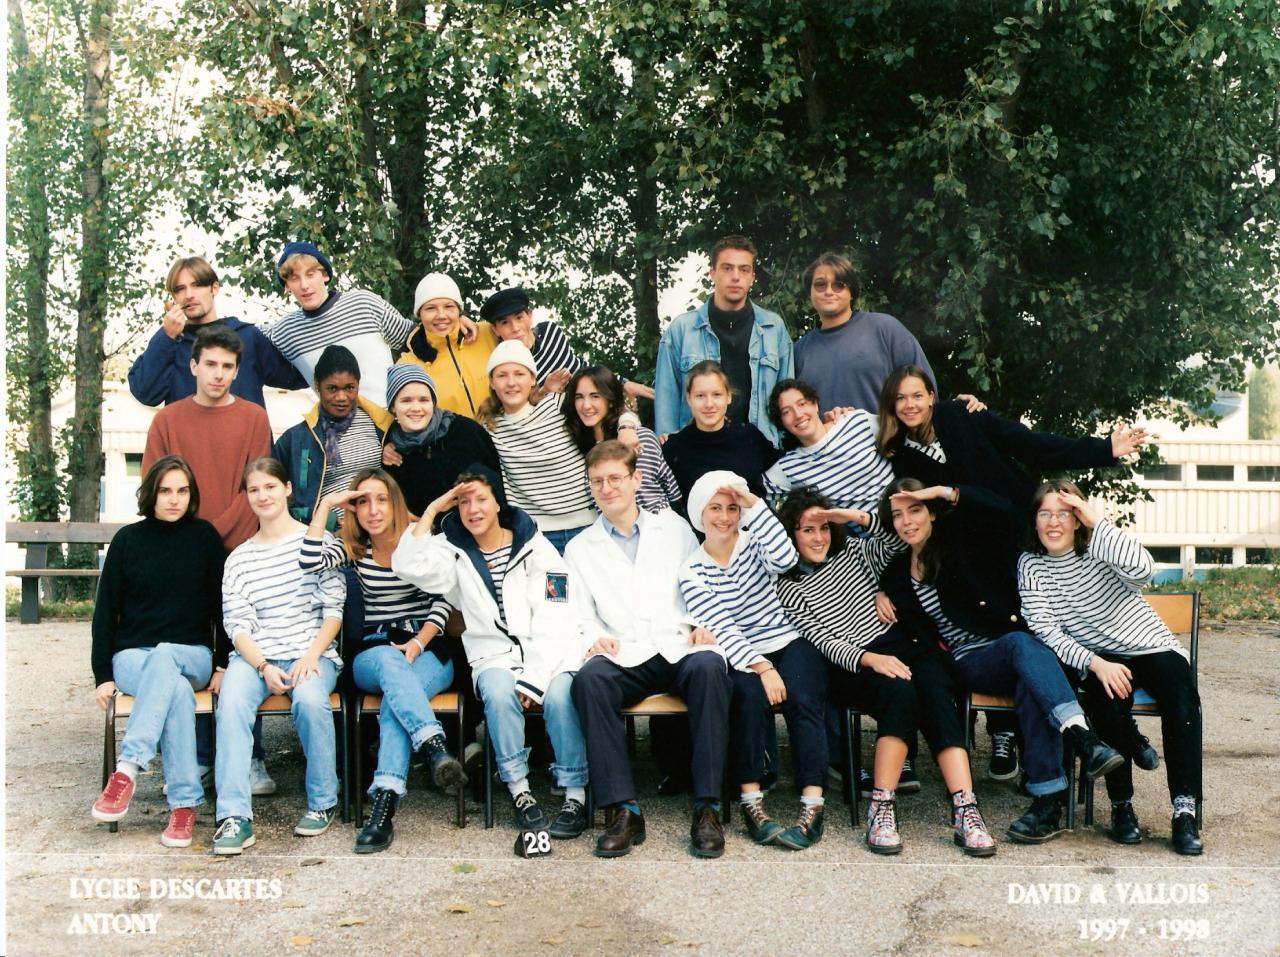 1998 - TL2 - DAVID